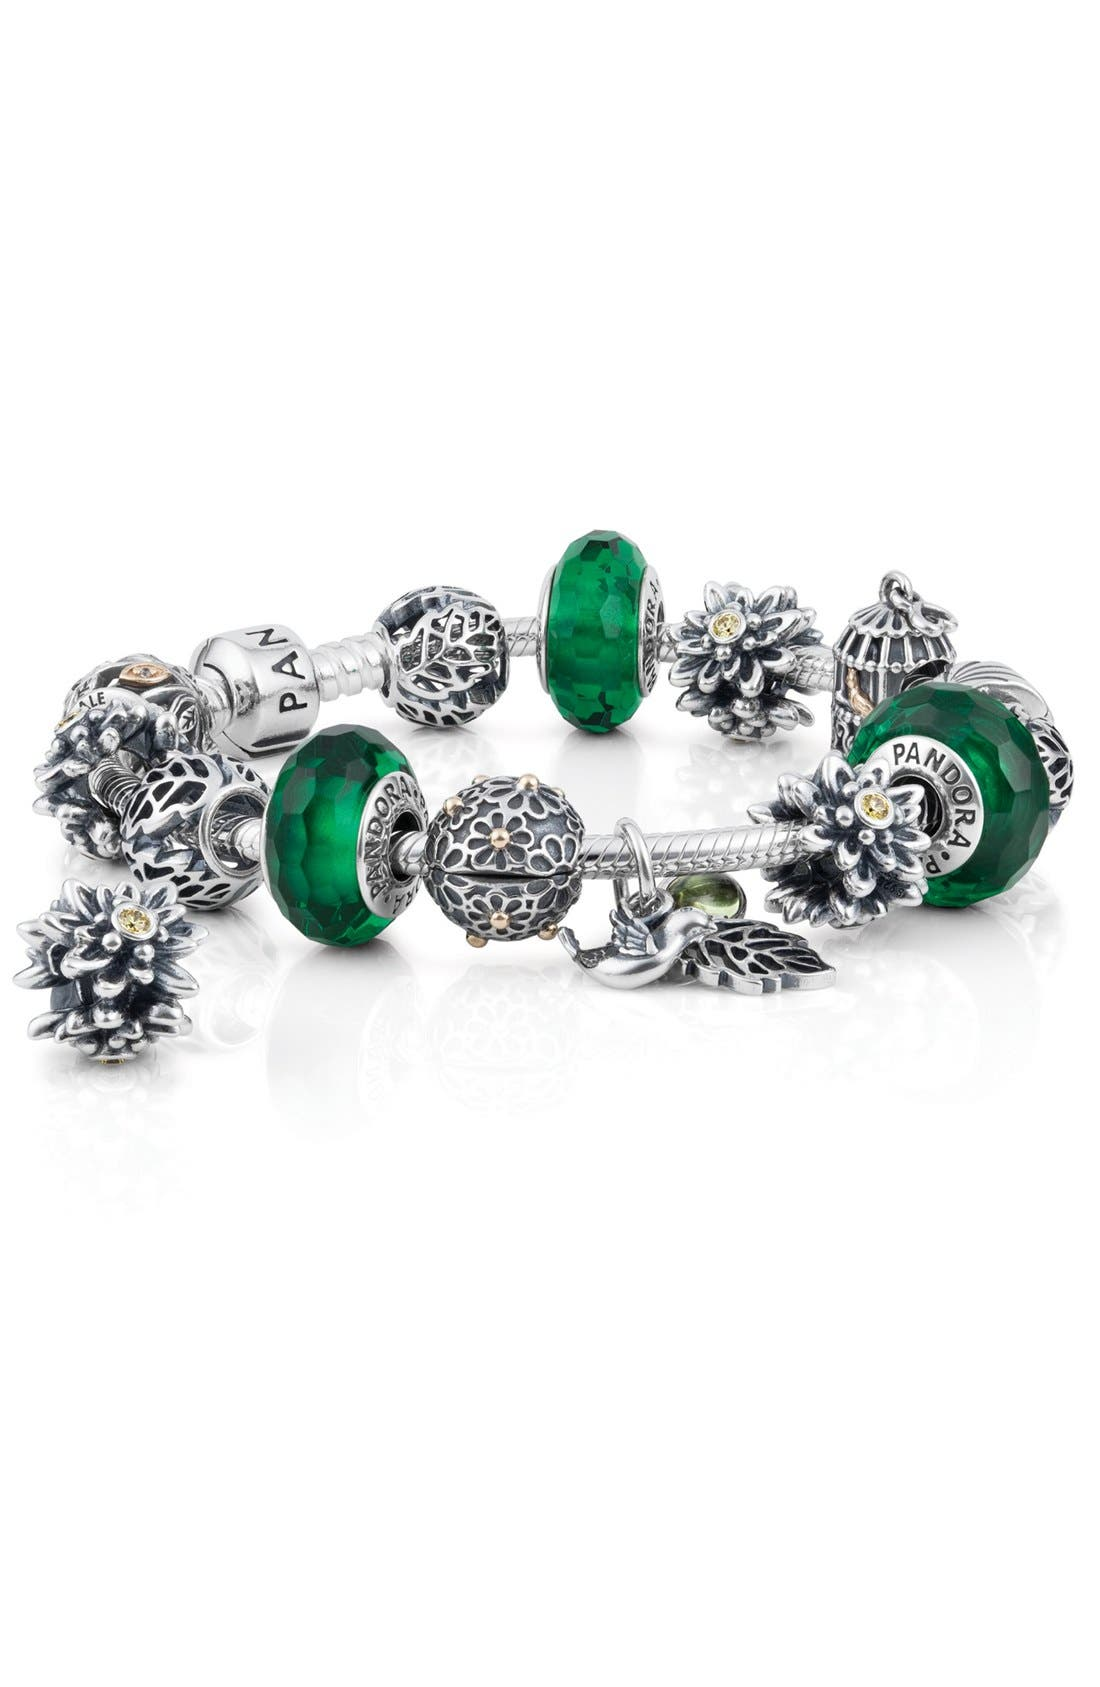 Alternate Image 1 Selected - PANDORA Charm Bracelet & Charms